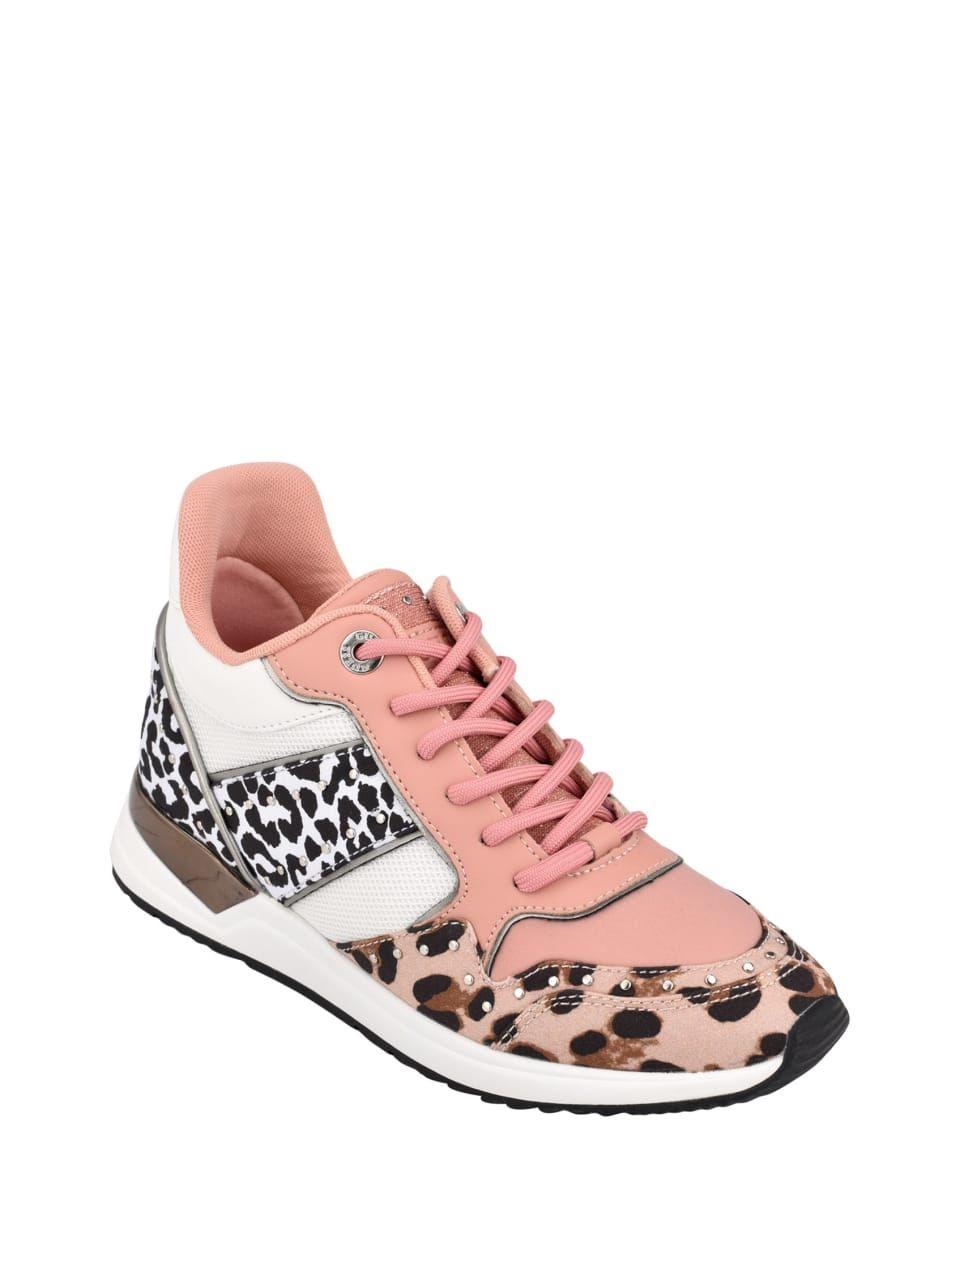 Rejjy Animal Print Sneakers at Guess in